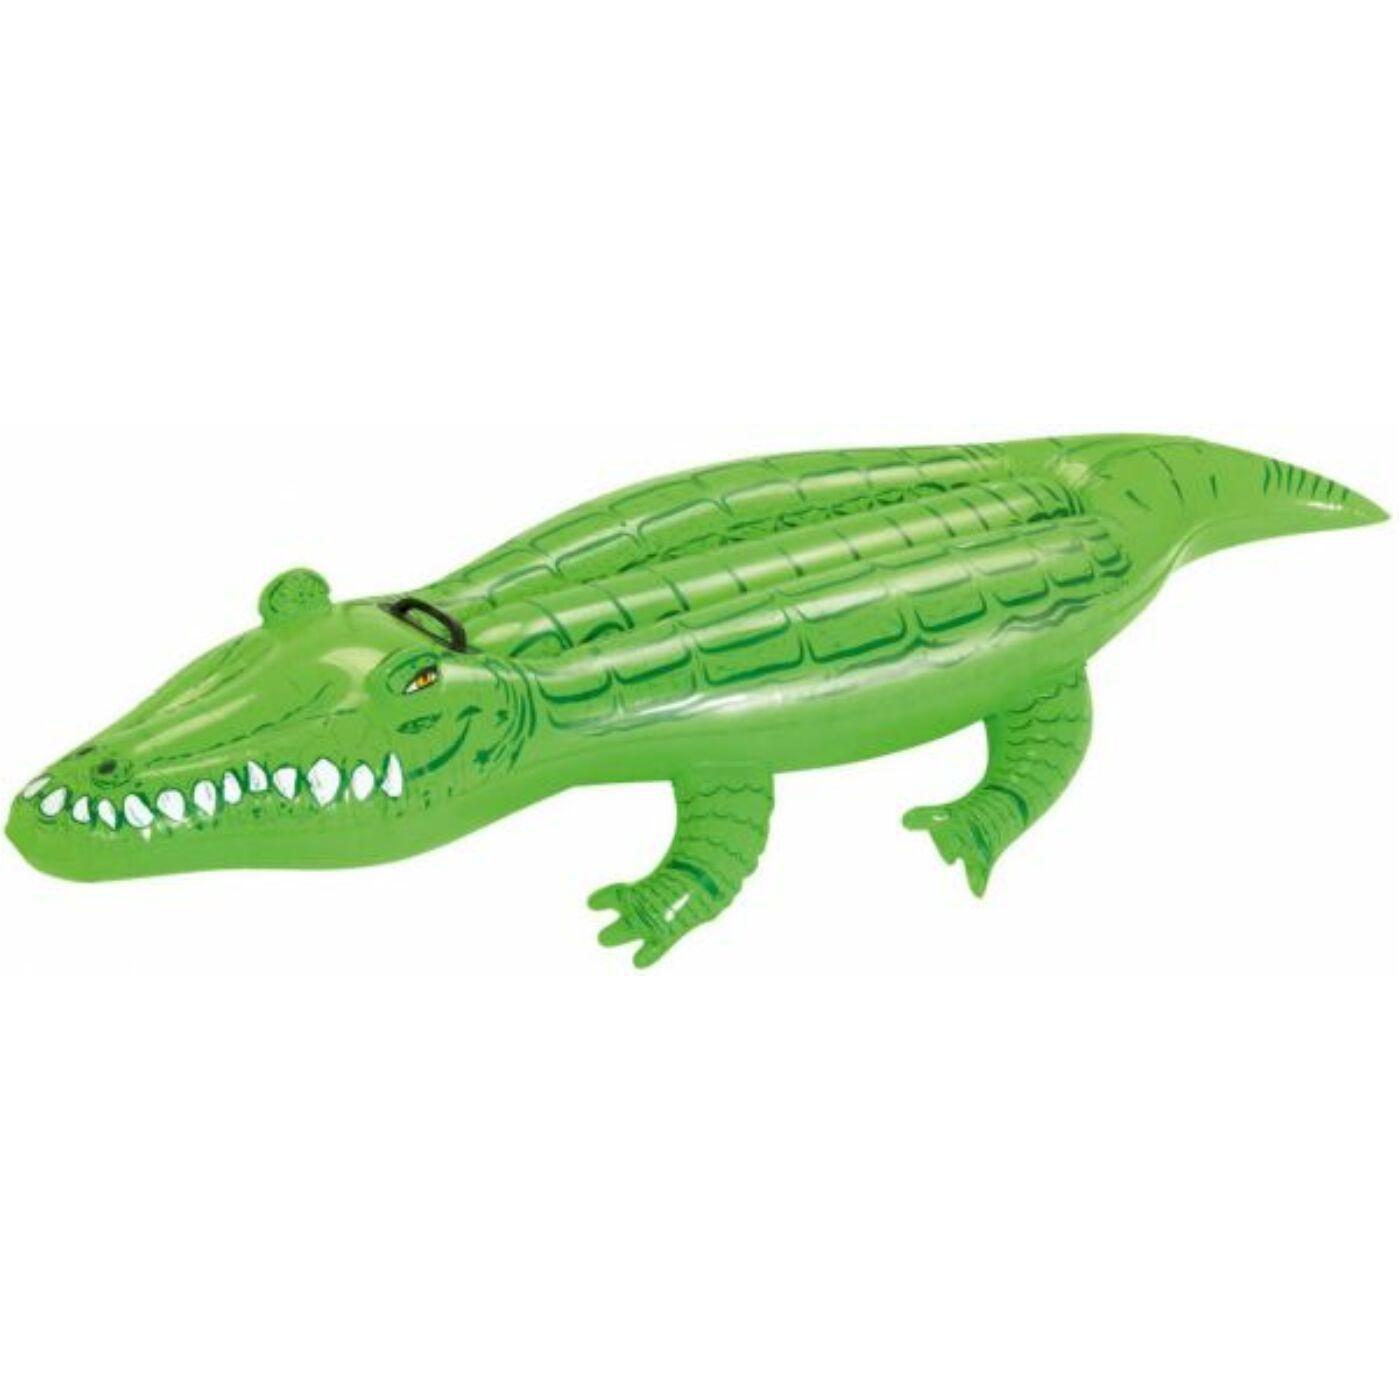 Krokodil hullámlovagló 203*117 cm